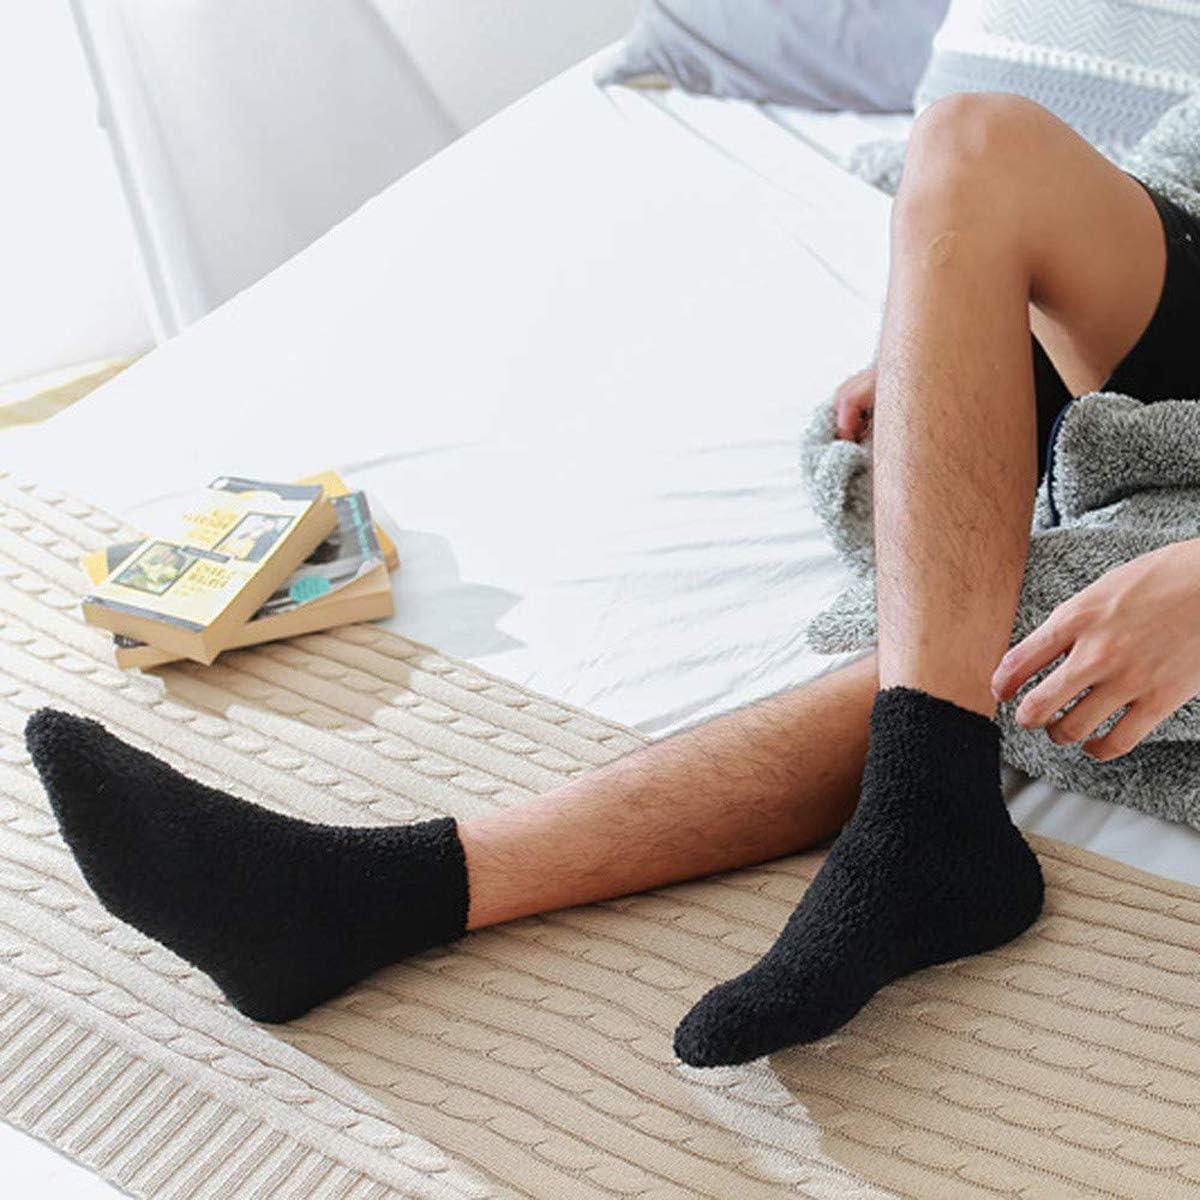 LERTREE 5 Pairs Womens Fuzzy Socks Soft Winter Warm Solid Socks for Ladies